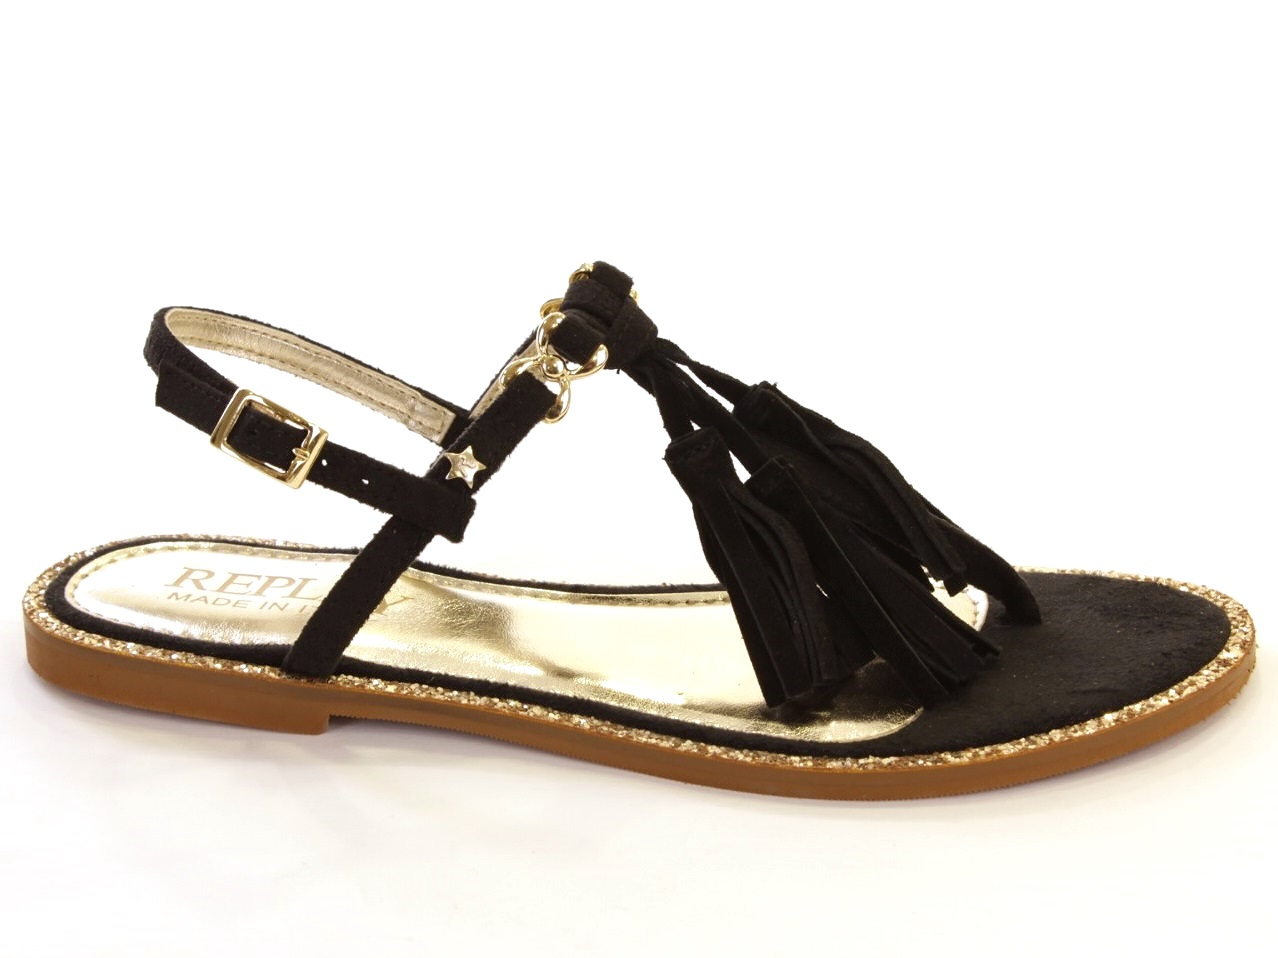 Sandales Plates Replay - 621 TERES